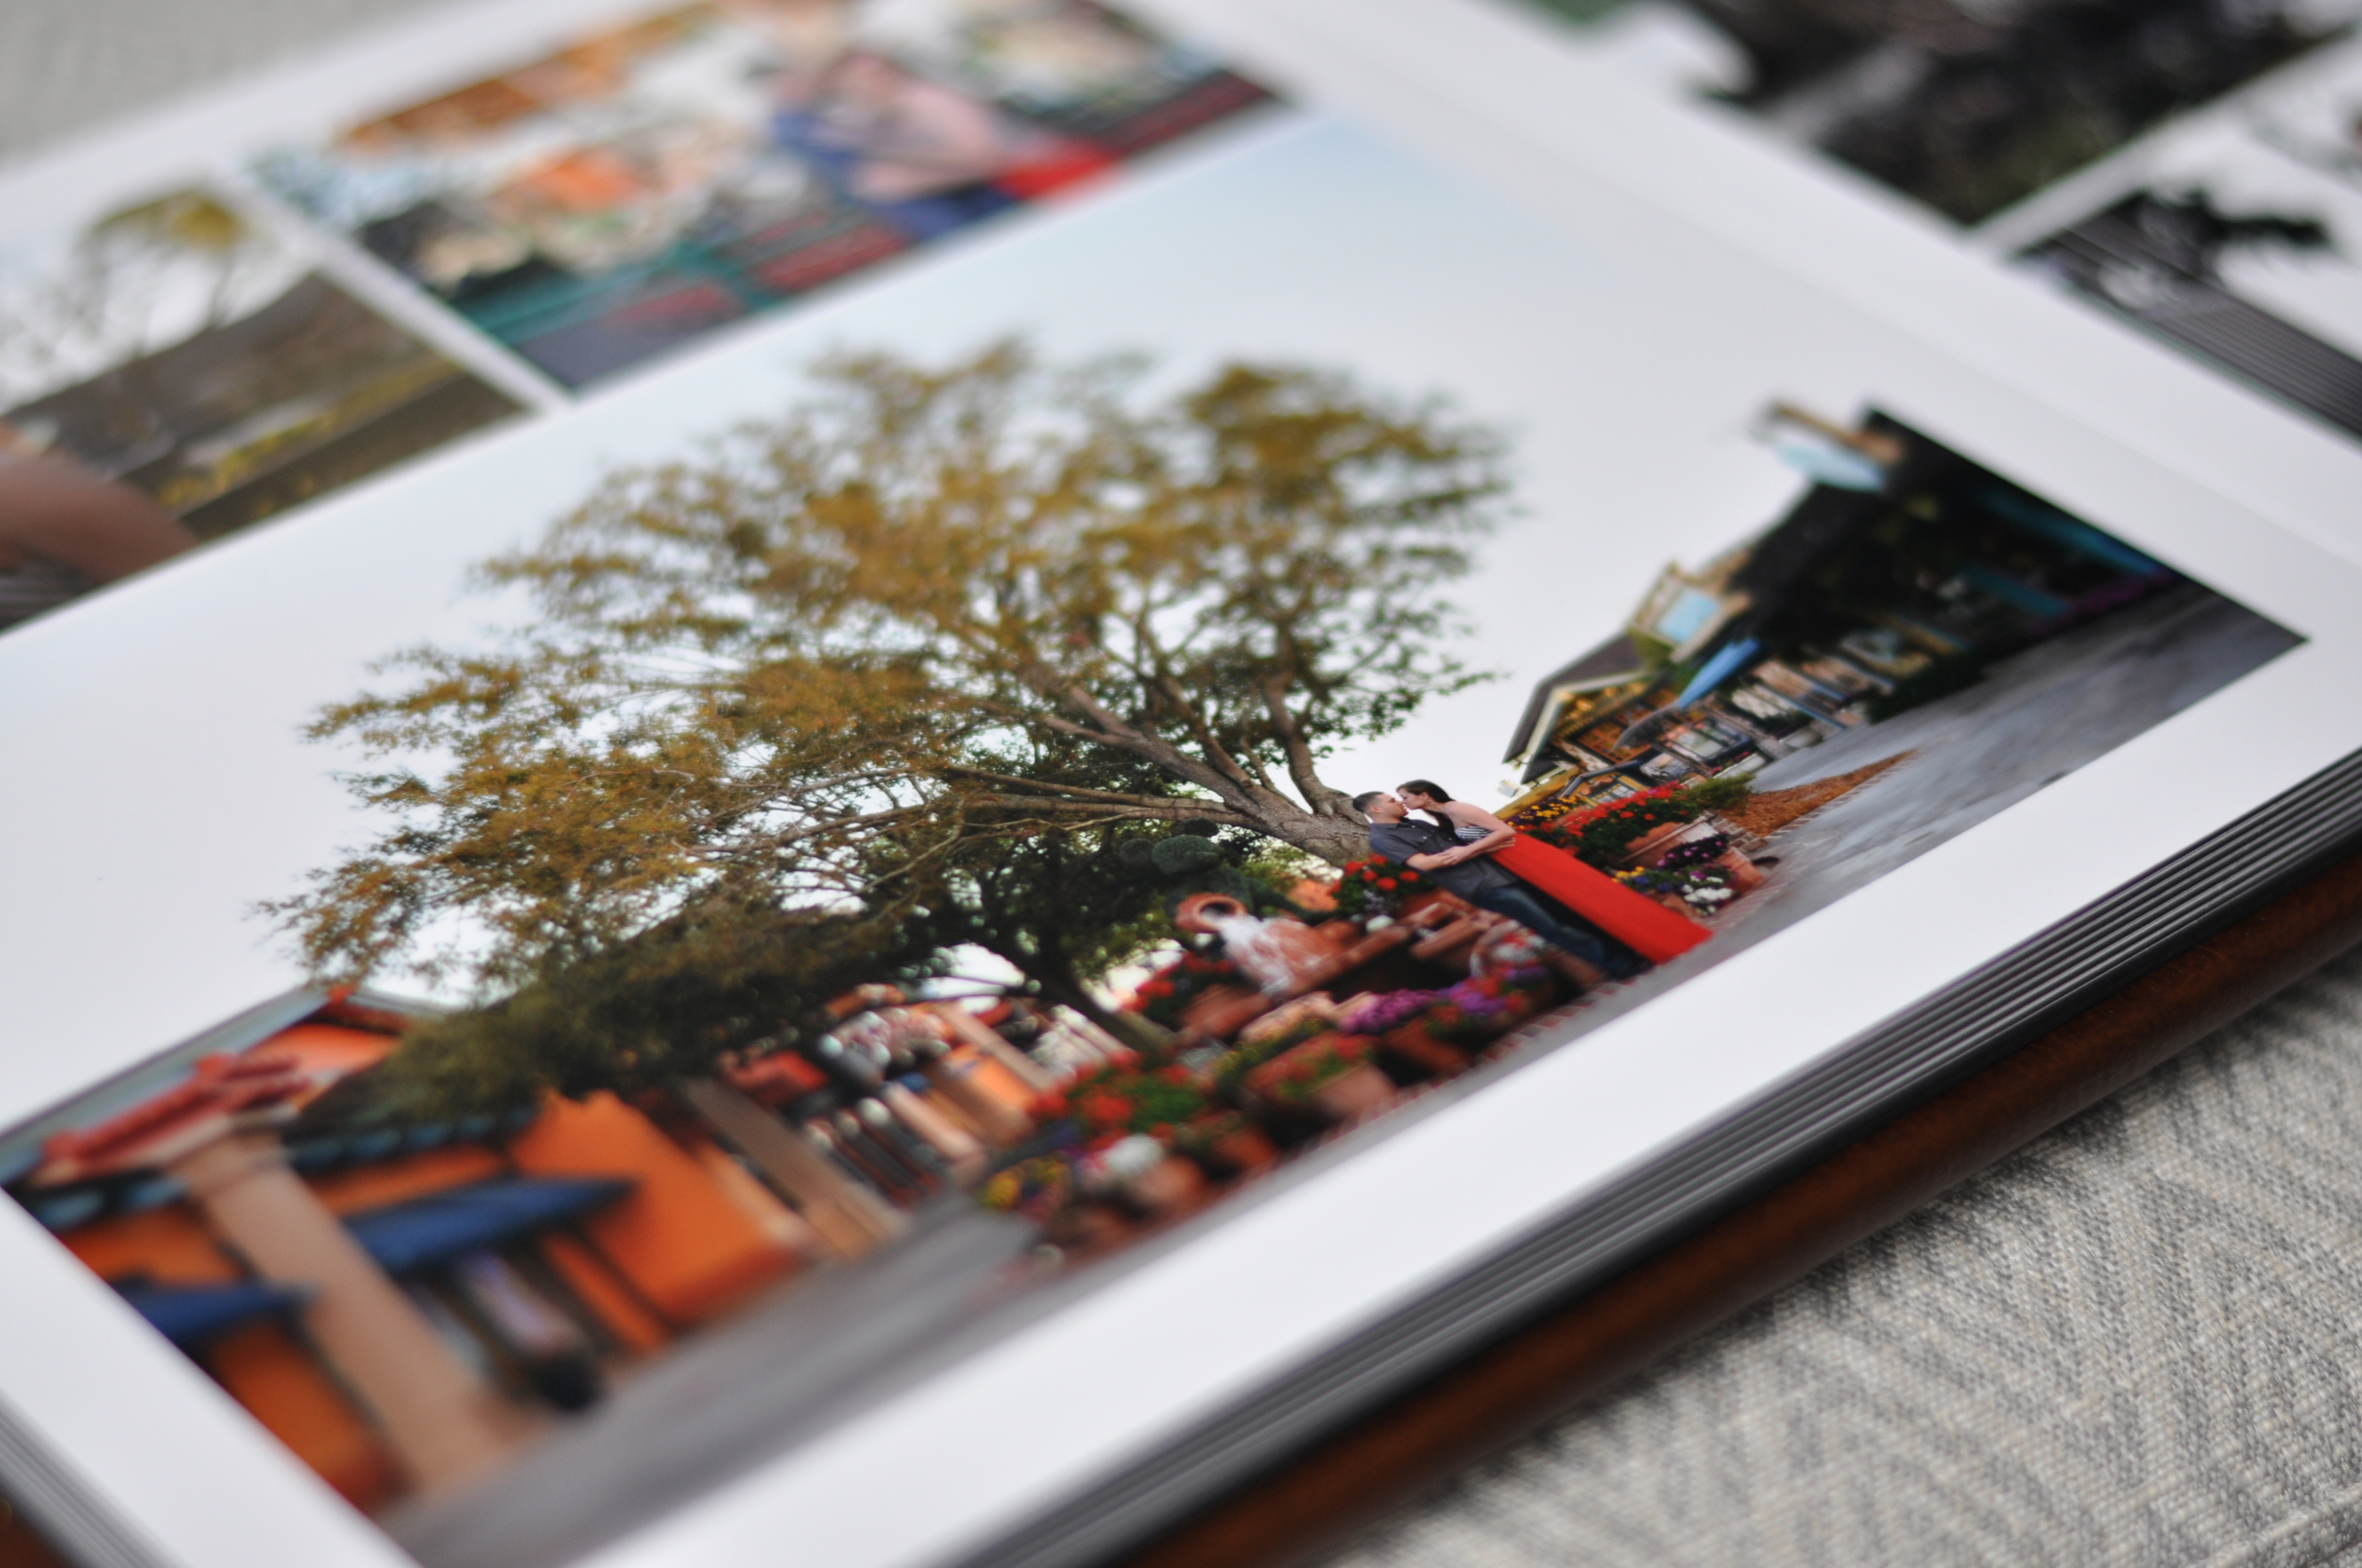 AlbumSample16.jpg